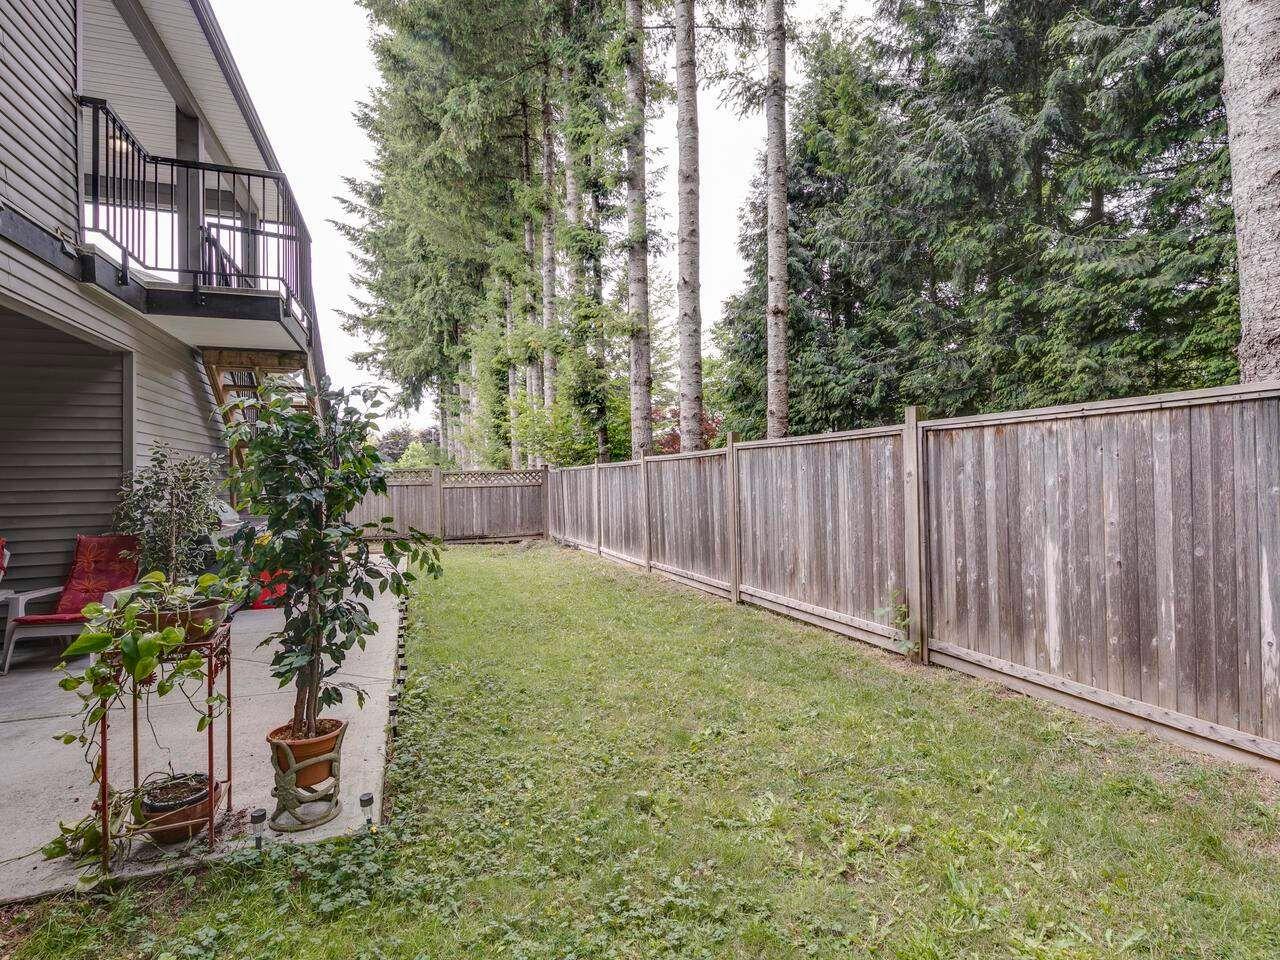 "Photo 33: Photos: 22845 126B Avenue in Maple Ridge: East Central House for sale in ""EAST CENTRAL MAPLE RIDGE"" : MLS®# R2594638"